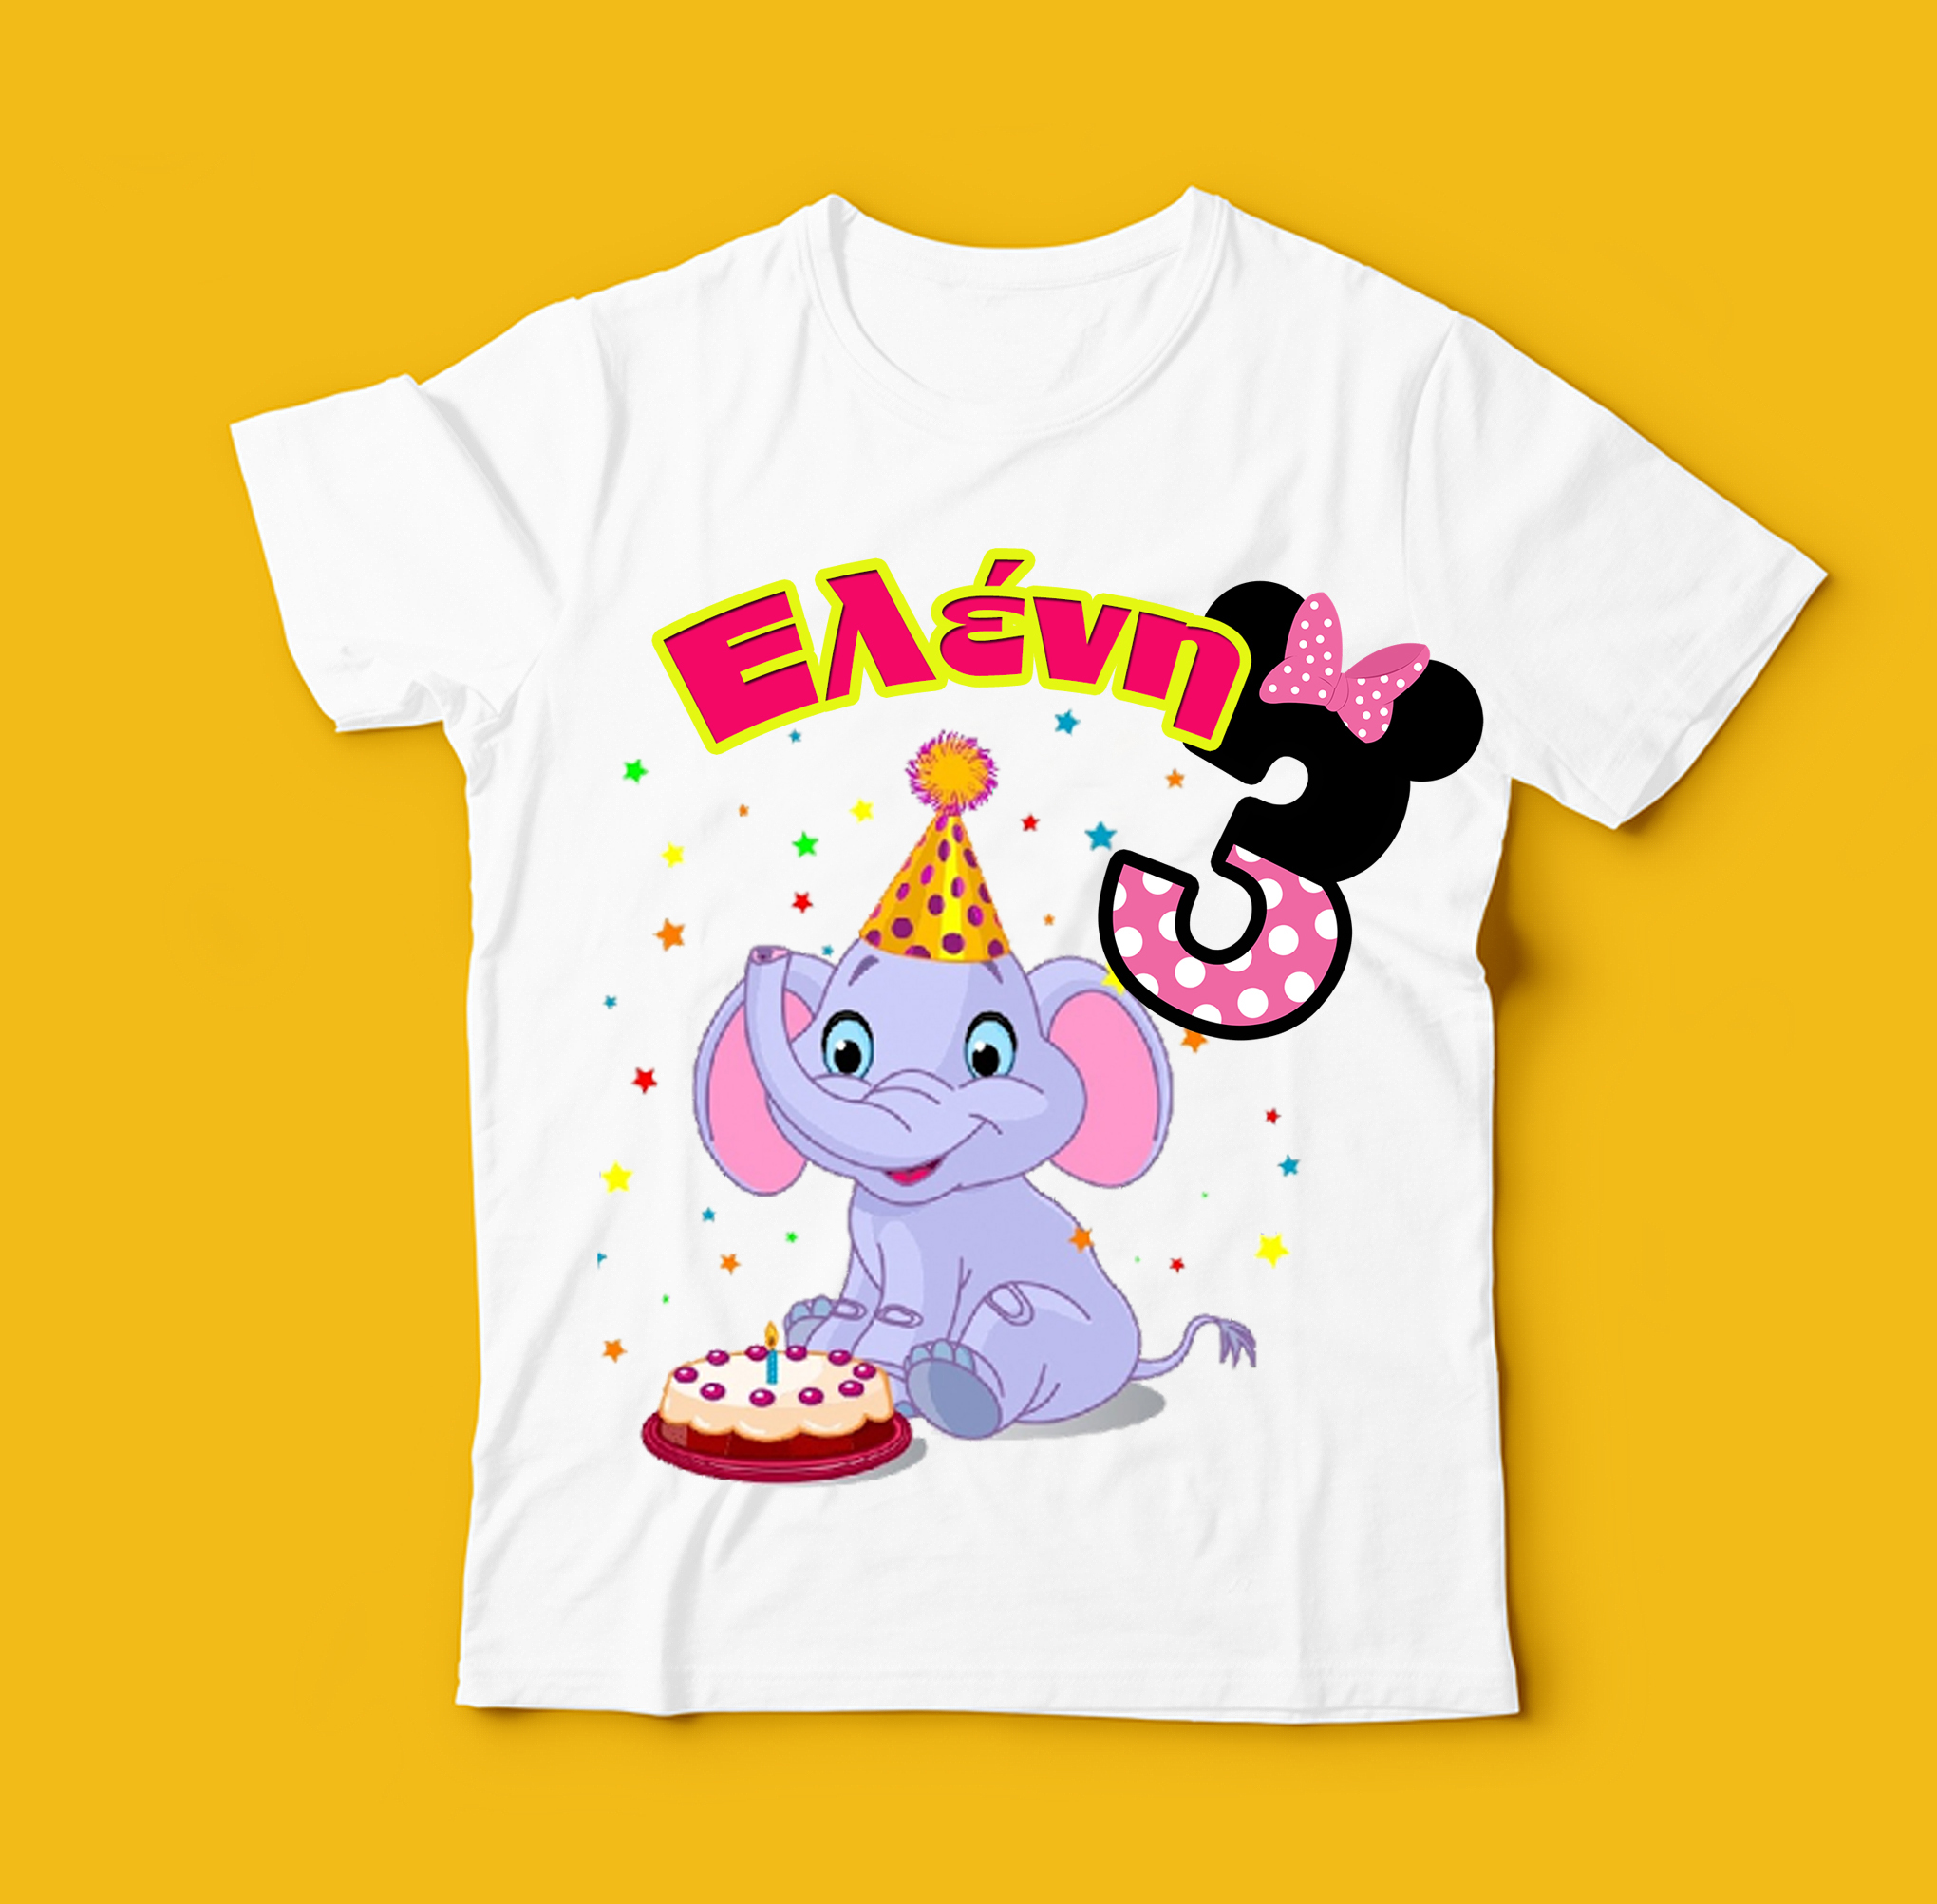 a13422ac182c Προσωποποιημένη μπλούζα Ελεφαντάκι - www.dwraki.gr